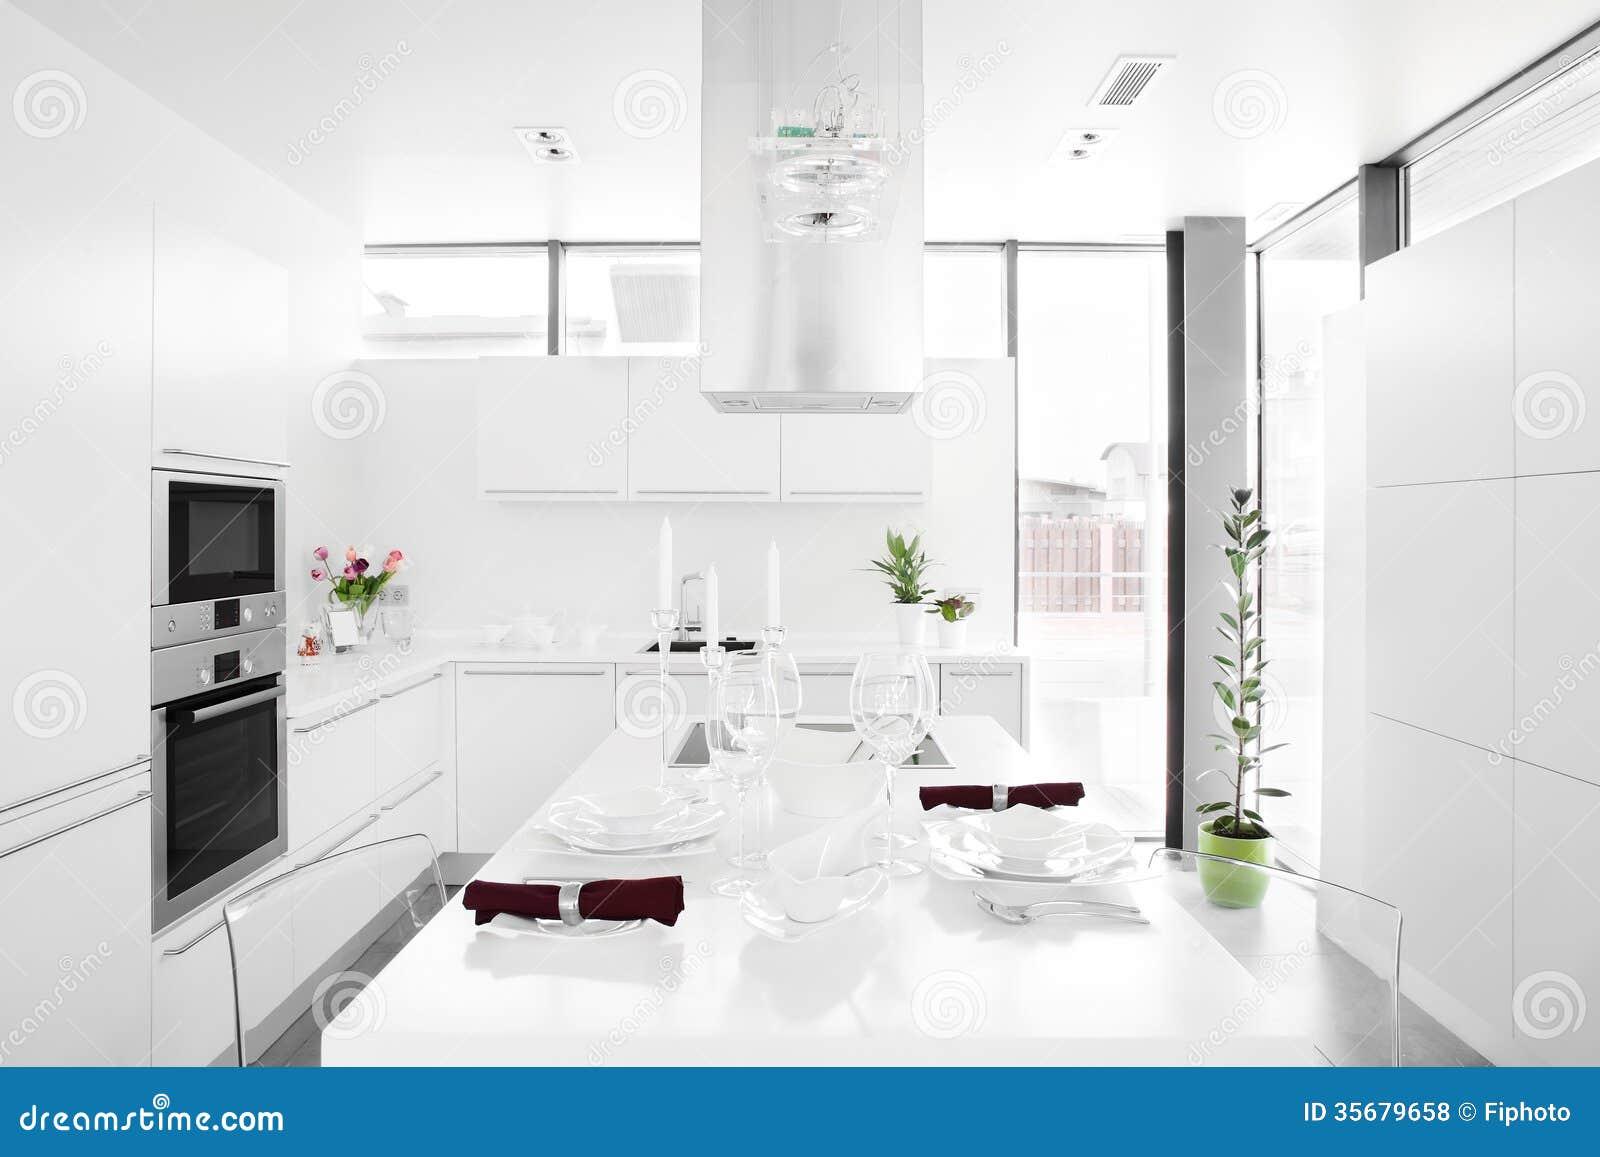 Moderne witte keuken met modieus meubilair royalty vrije stock ...